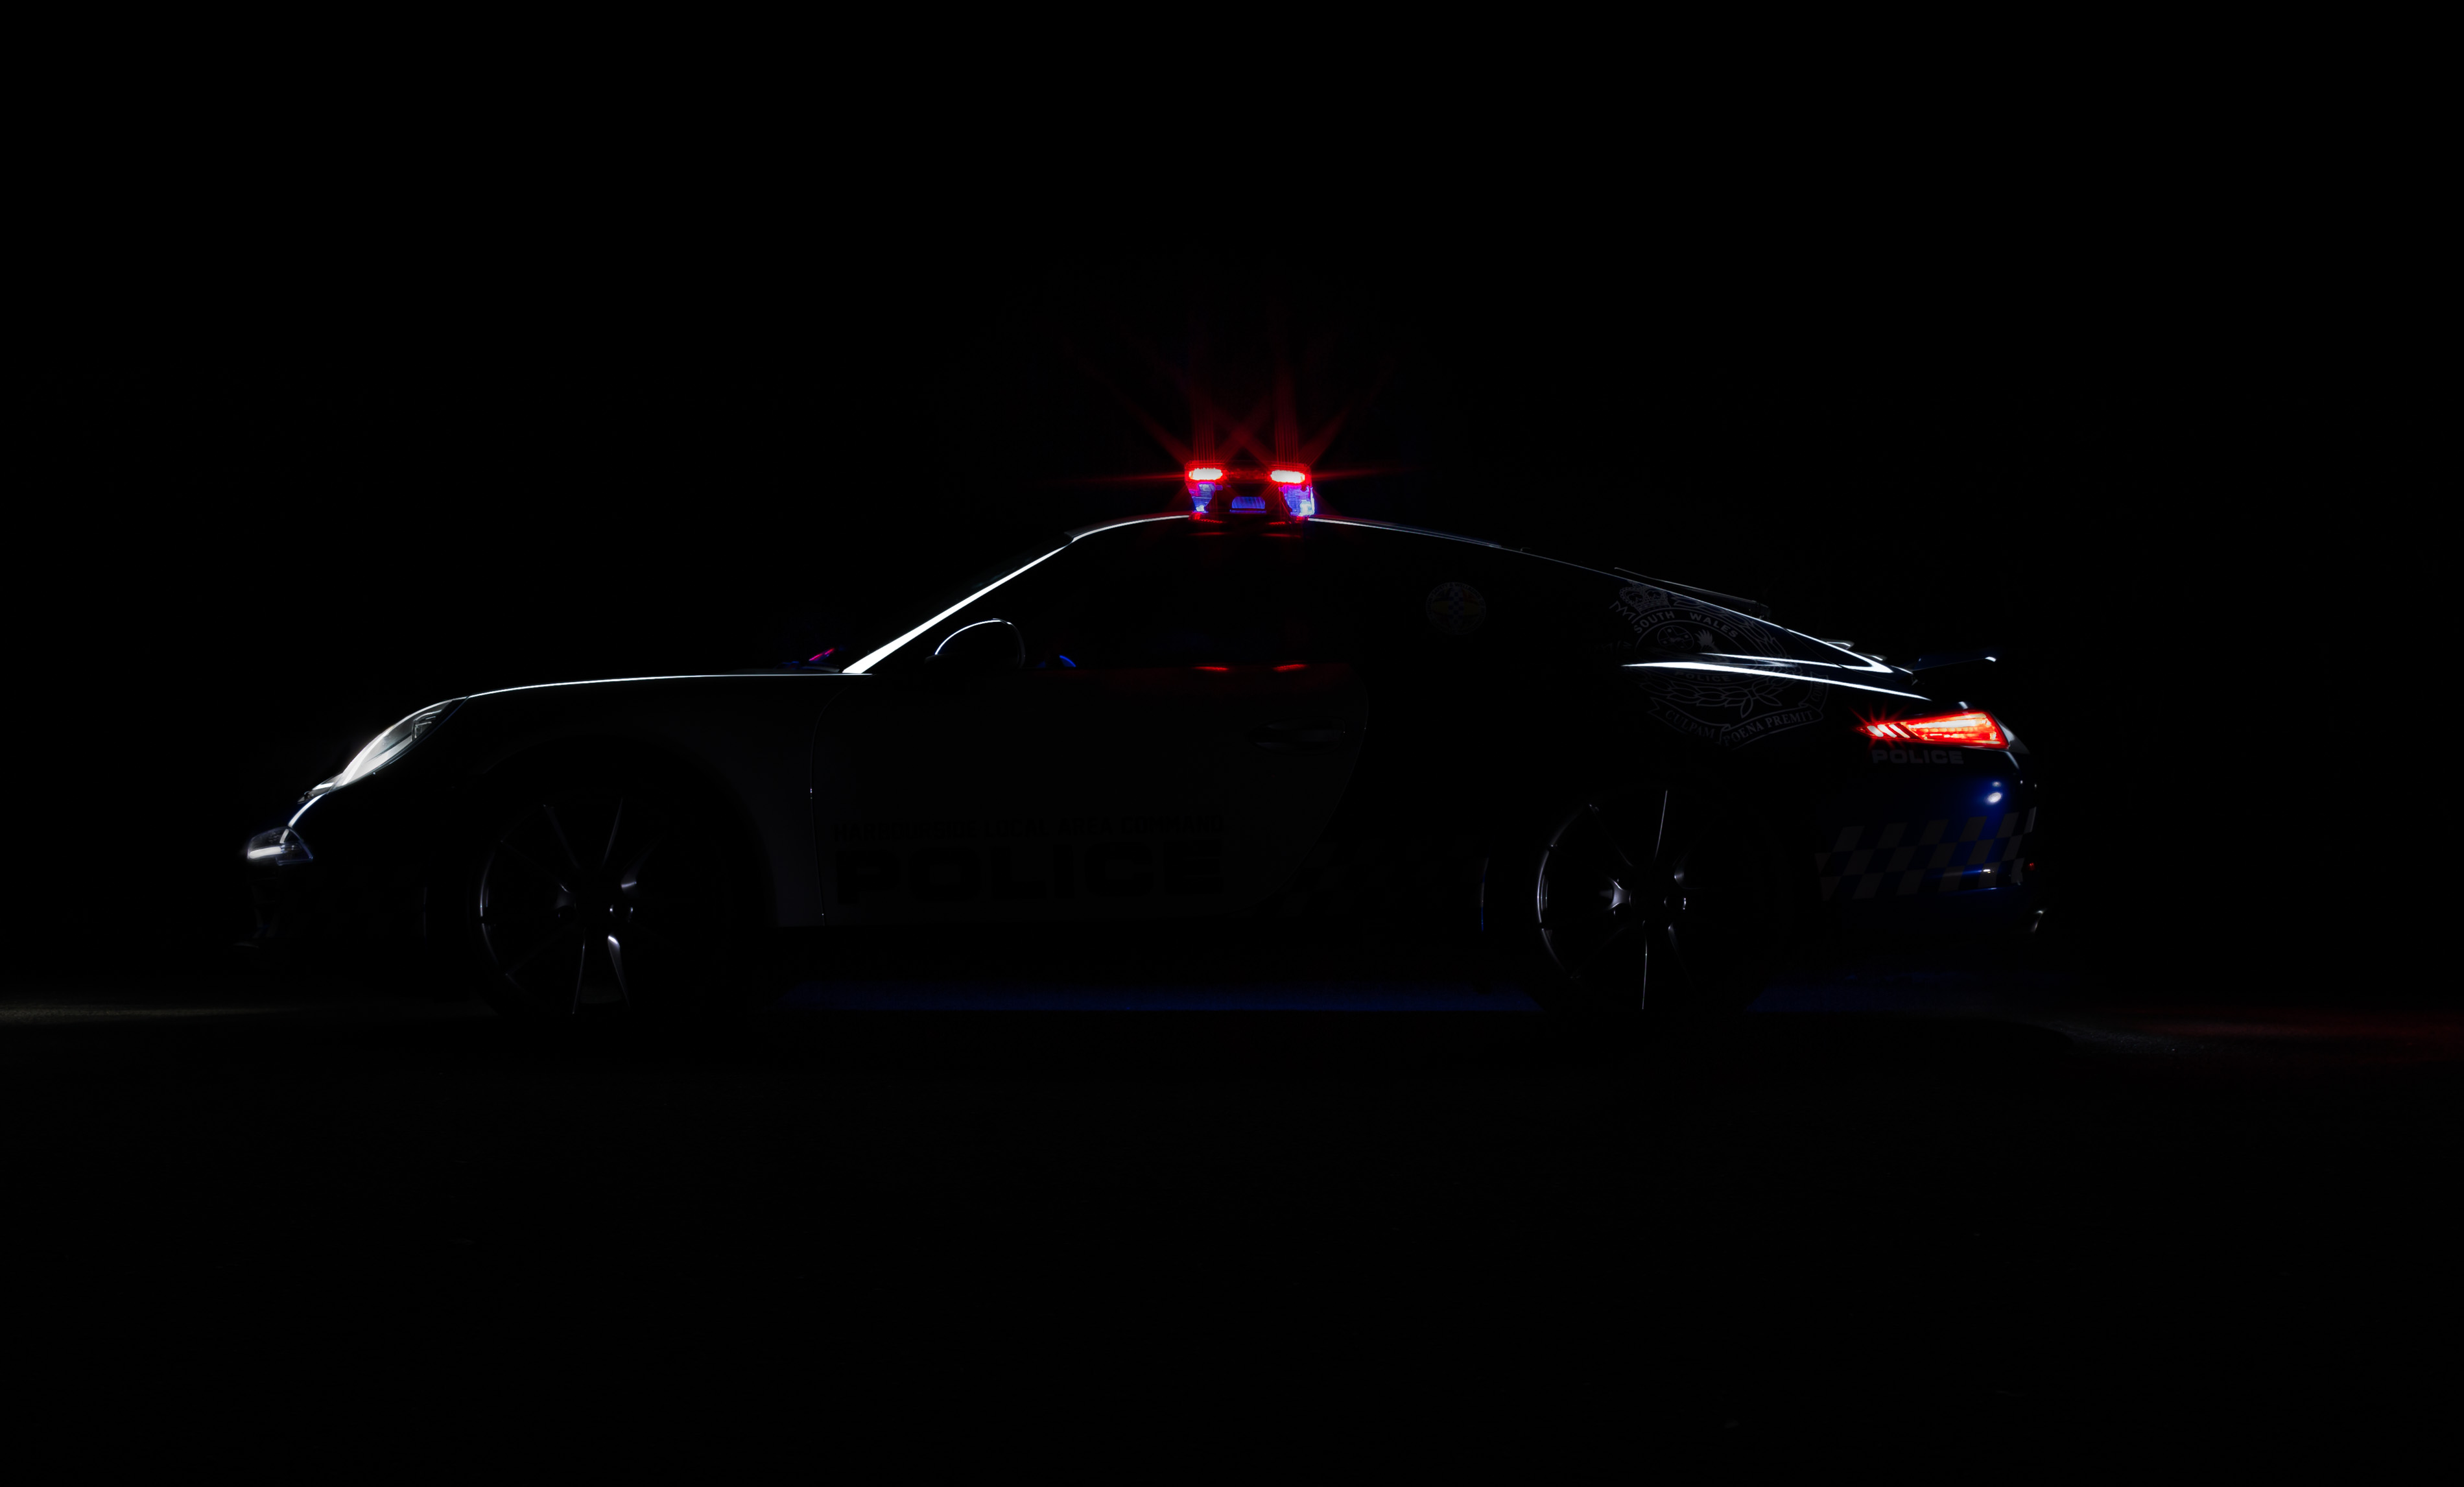 Top Sydney Harbourside Porsche police car photography - Farrow &FF_88